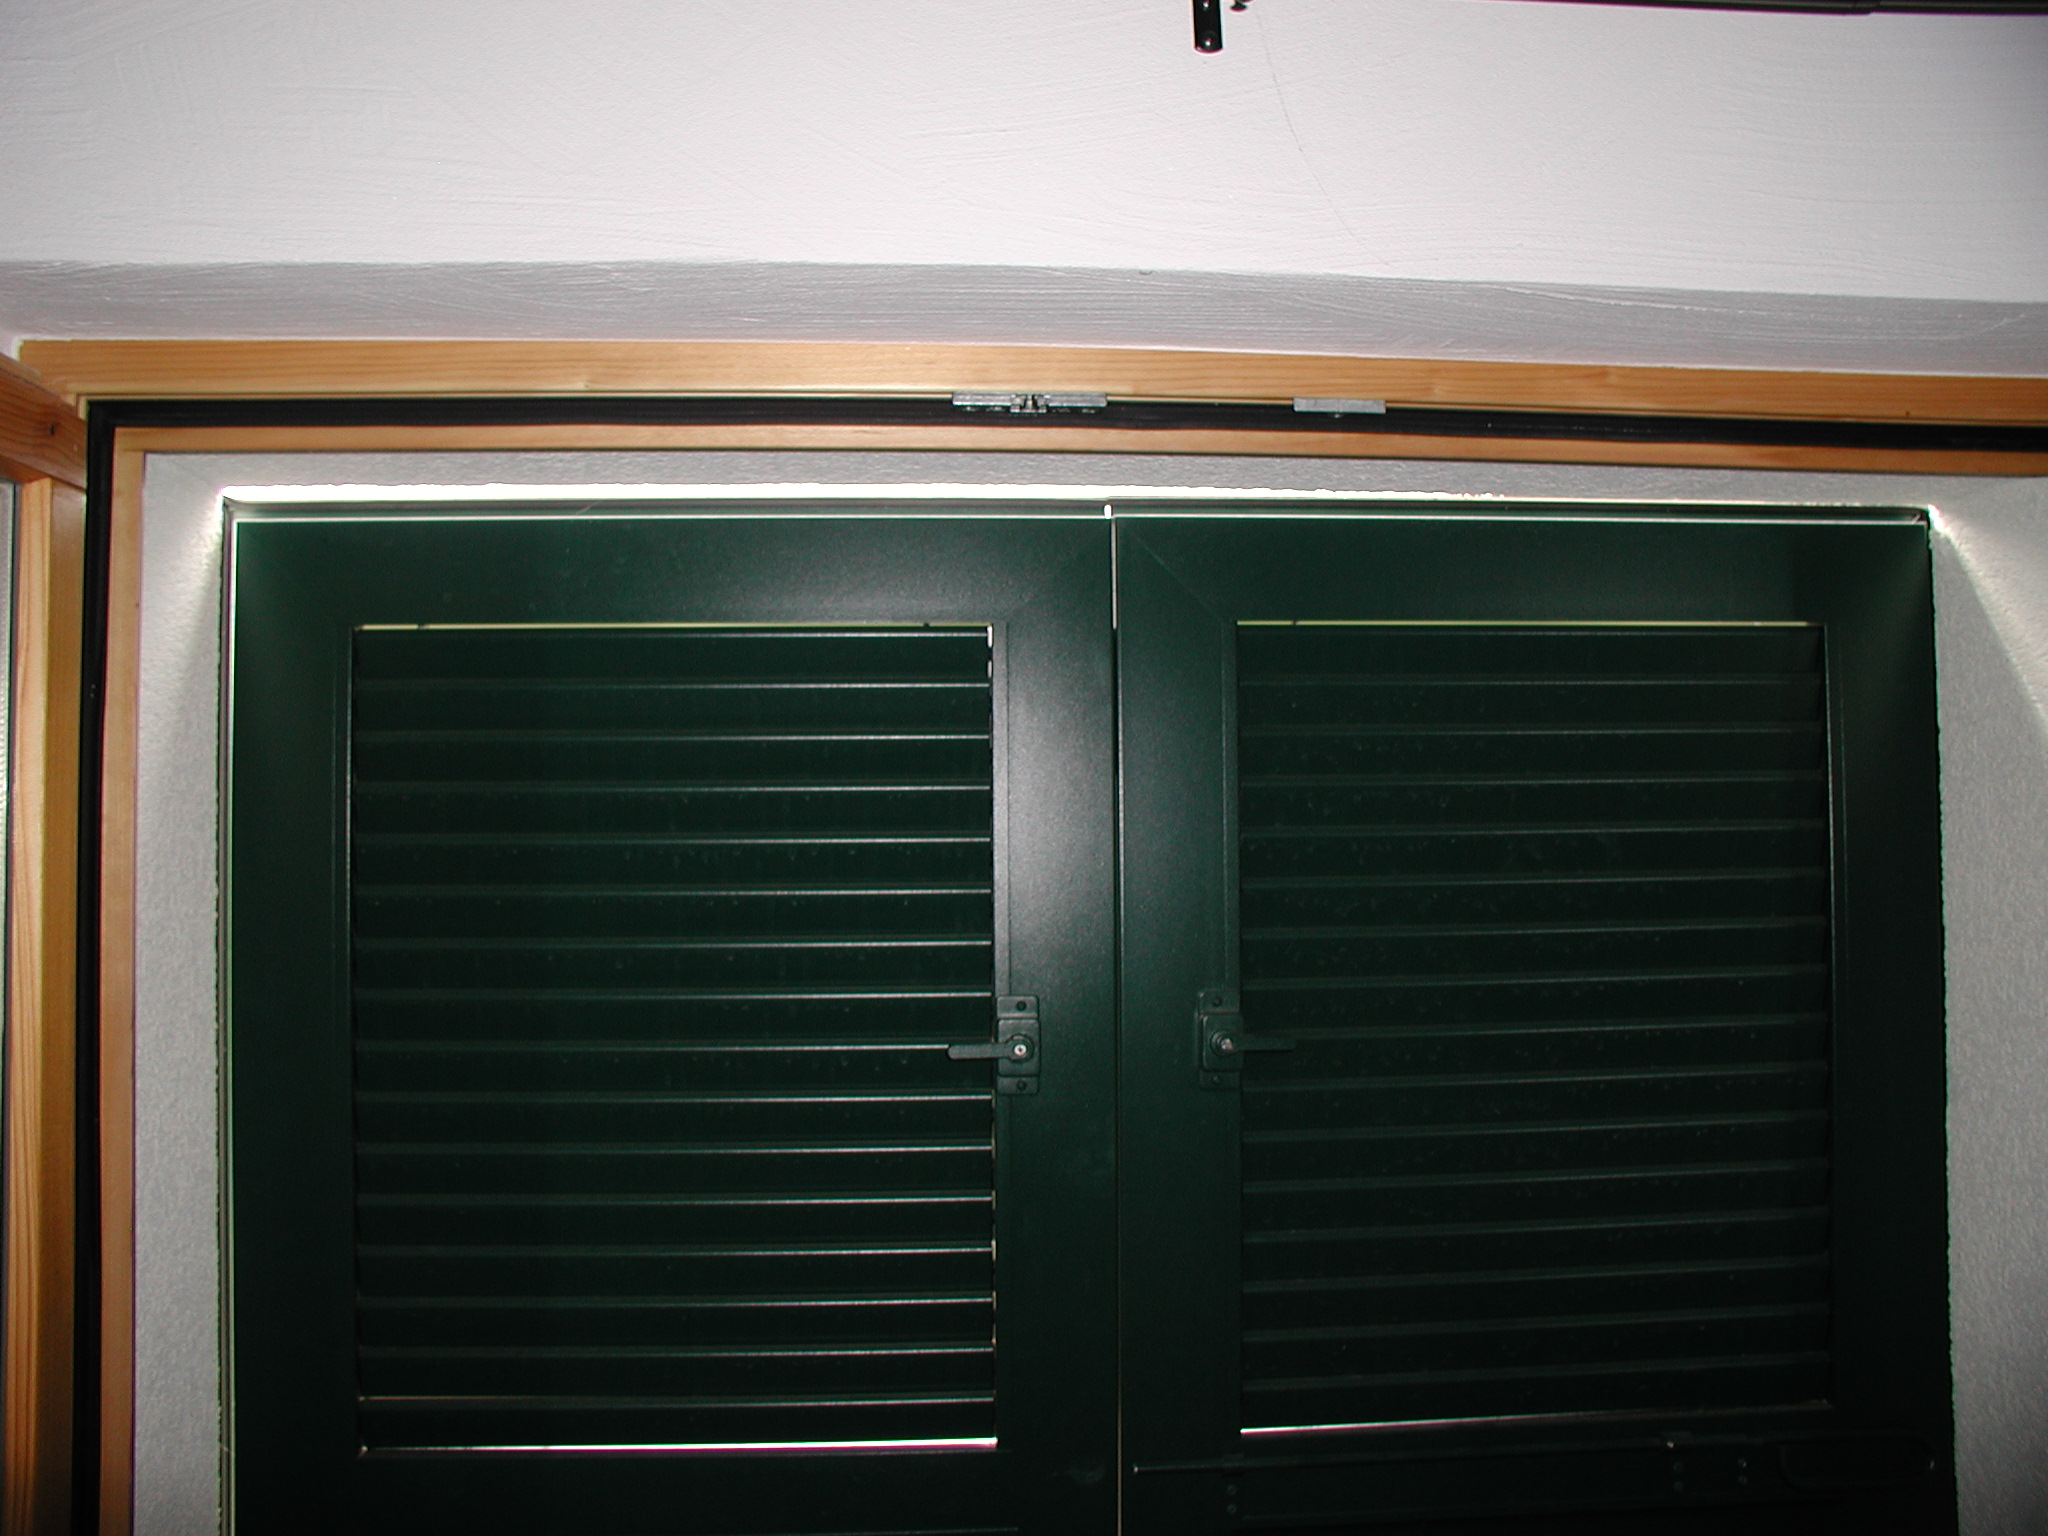 schenker storen bolay 39 s wiki. Black Bedroom Furniture Sets. Home Design Ideas